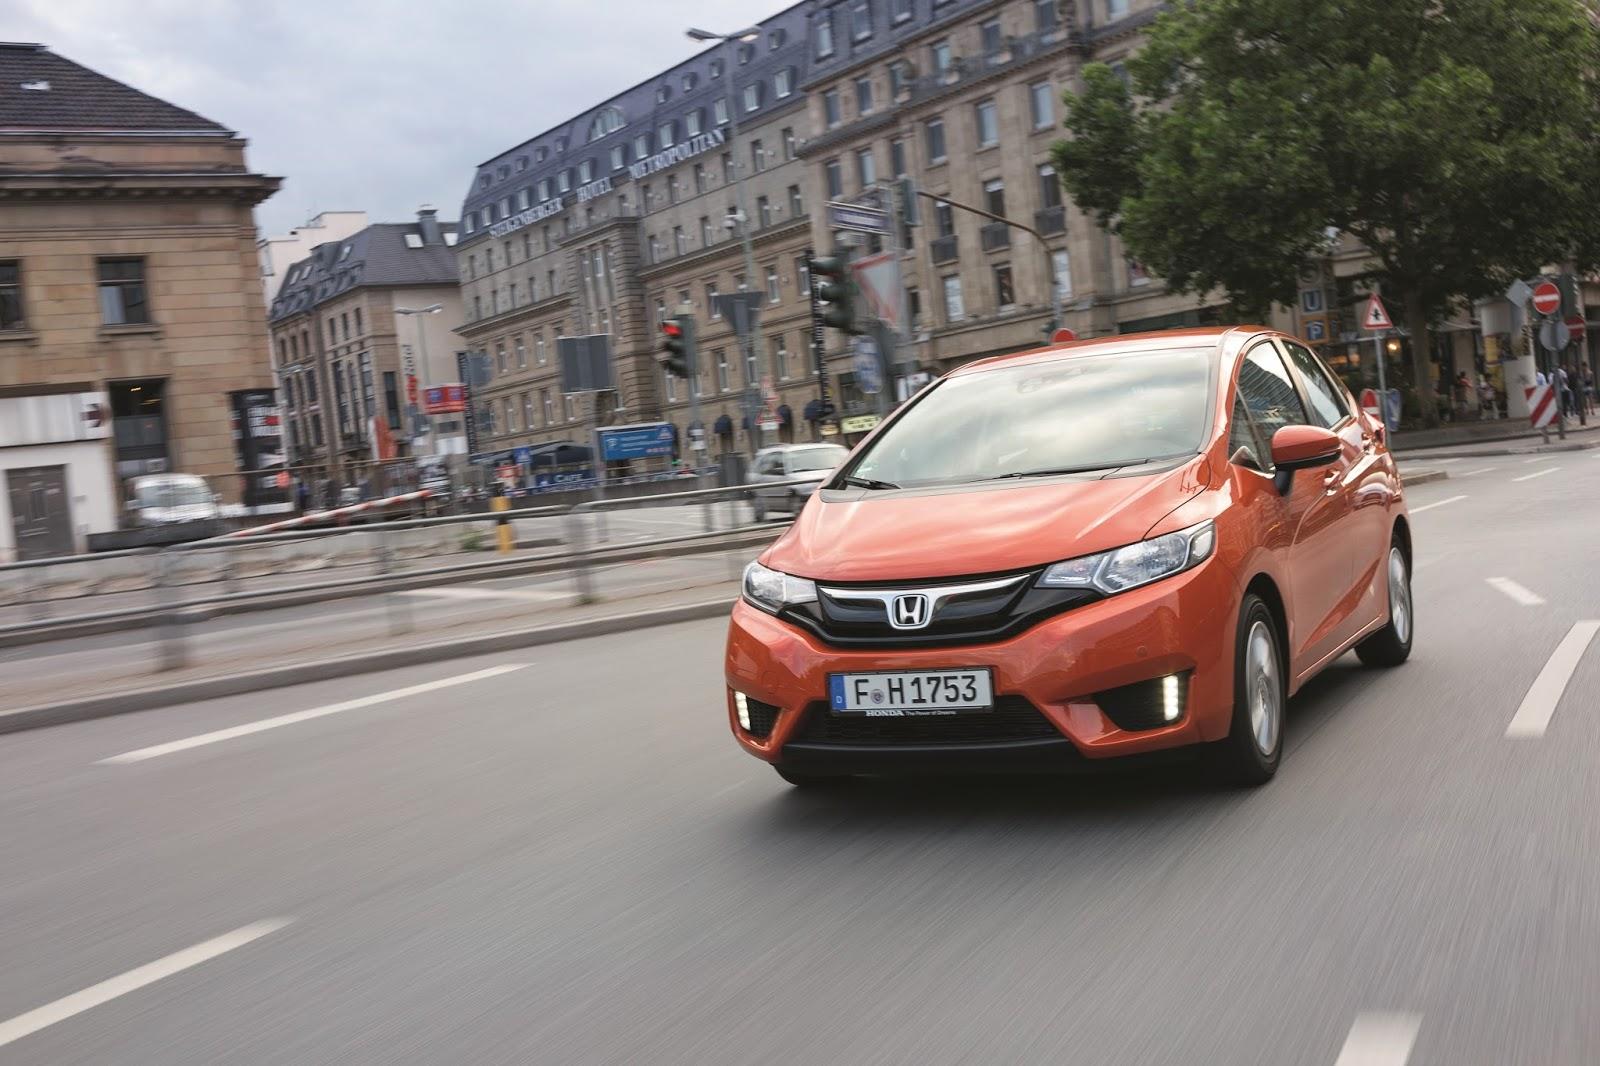 Honda Jazz Ασφάλεια 5 αστέρων για τα νέα HR-V και Jazz Euro NCAP, Honda, Honda HR-V, Honda Jazz